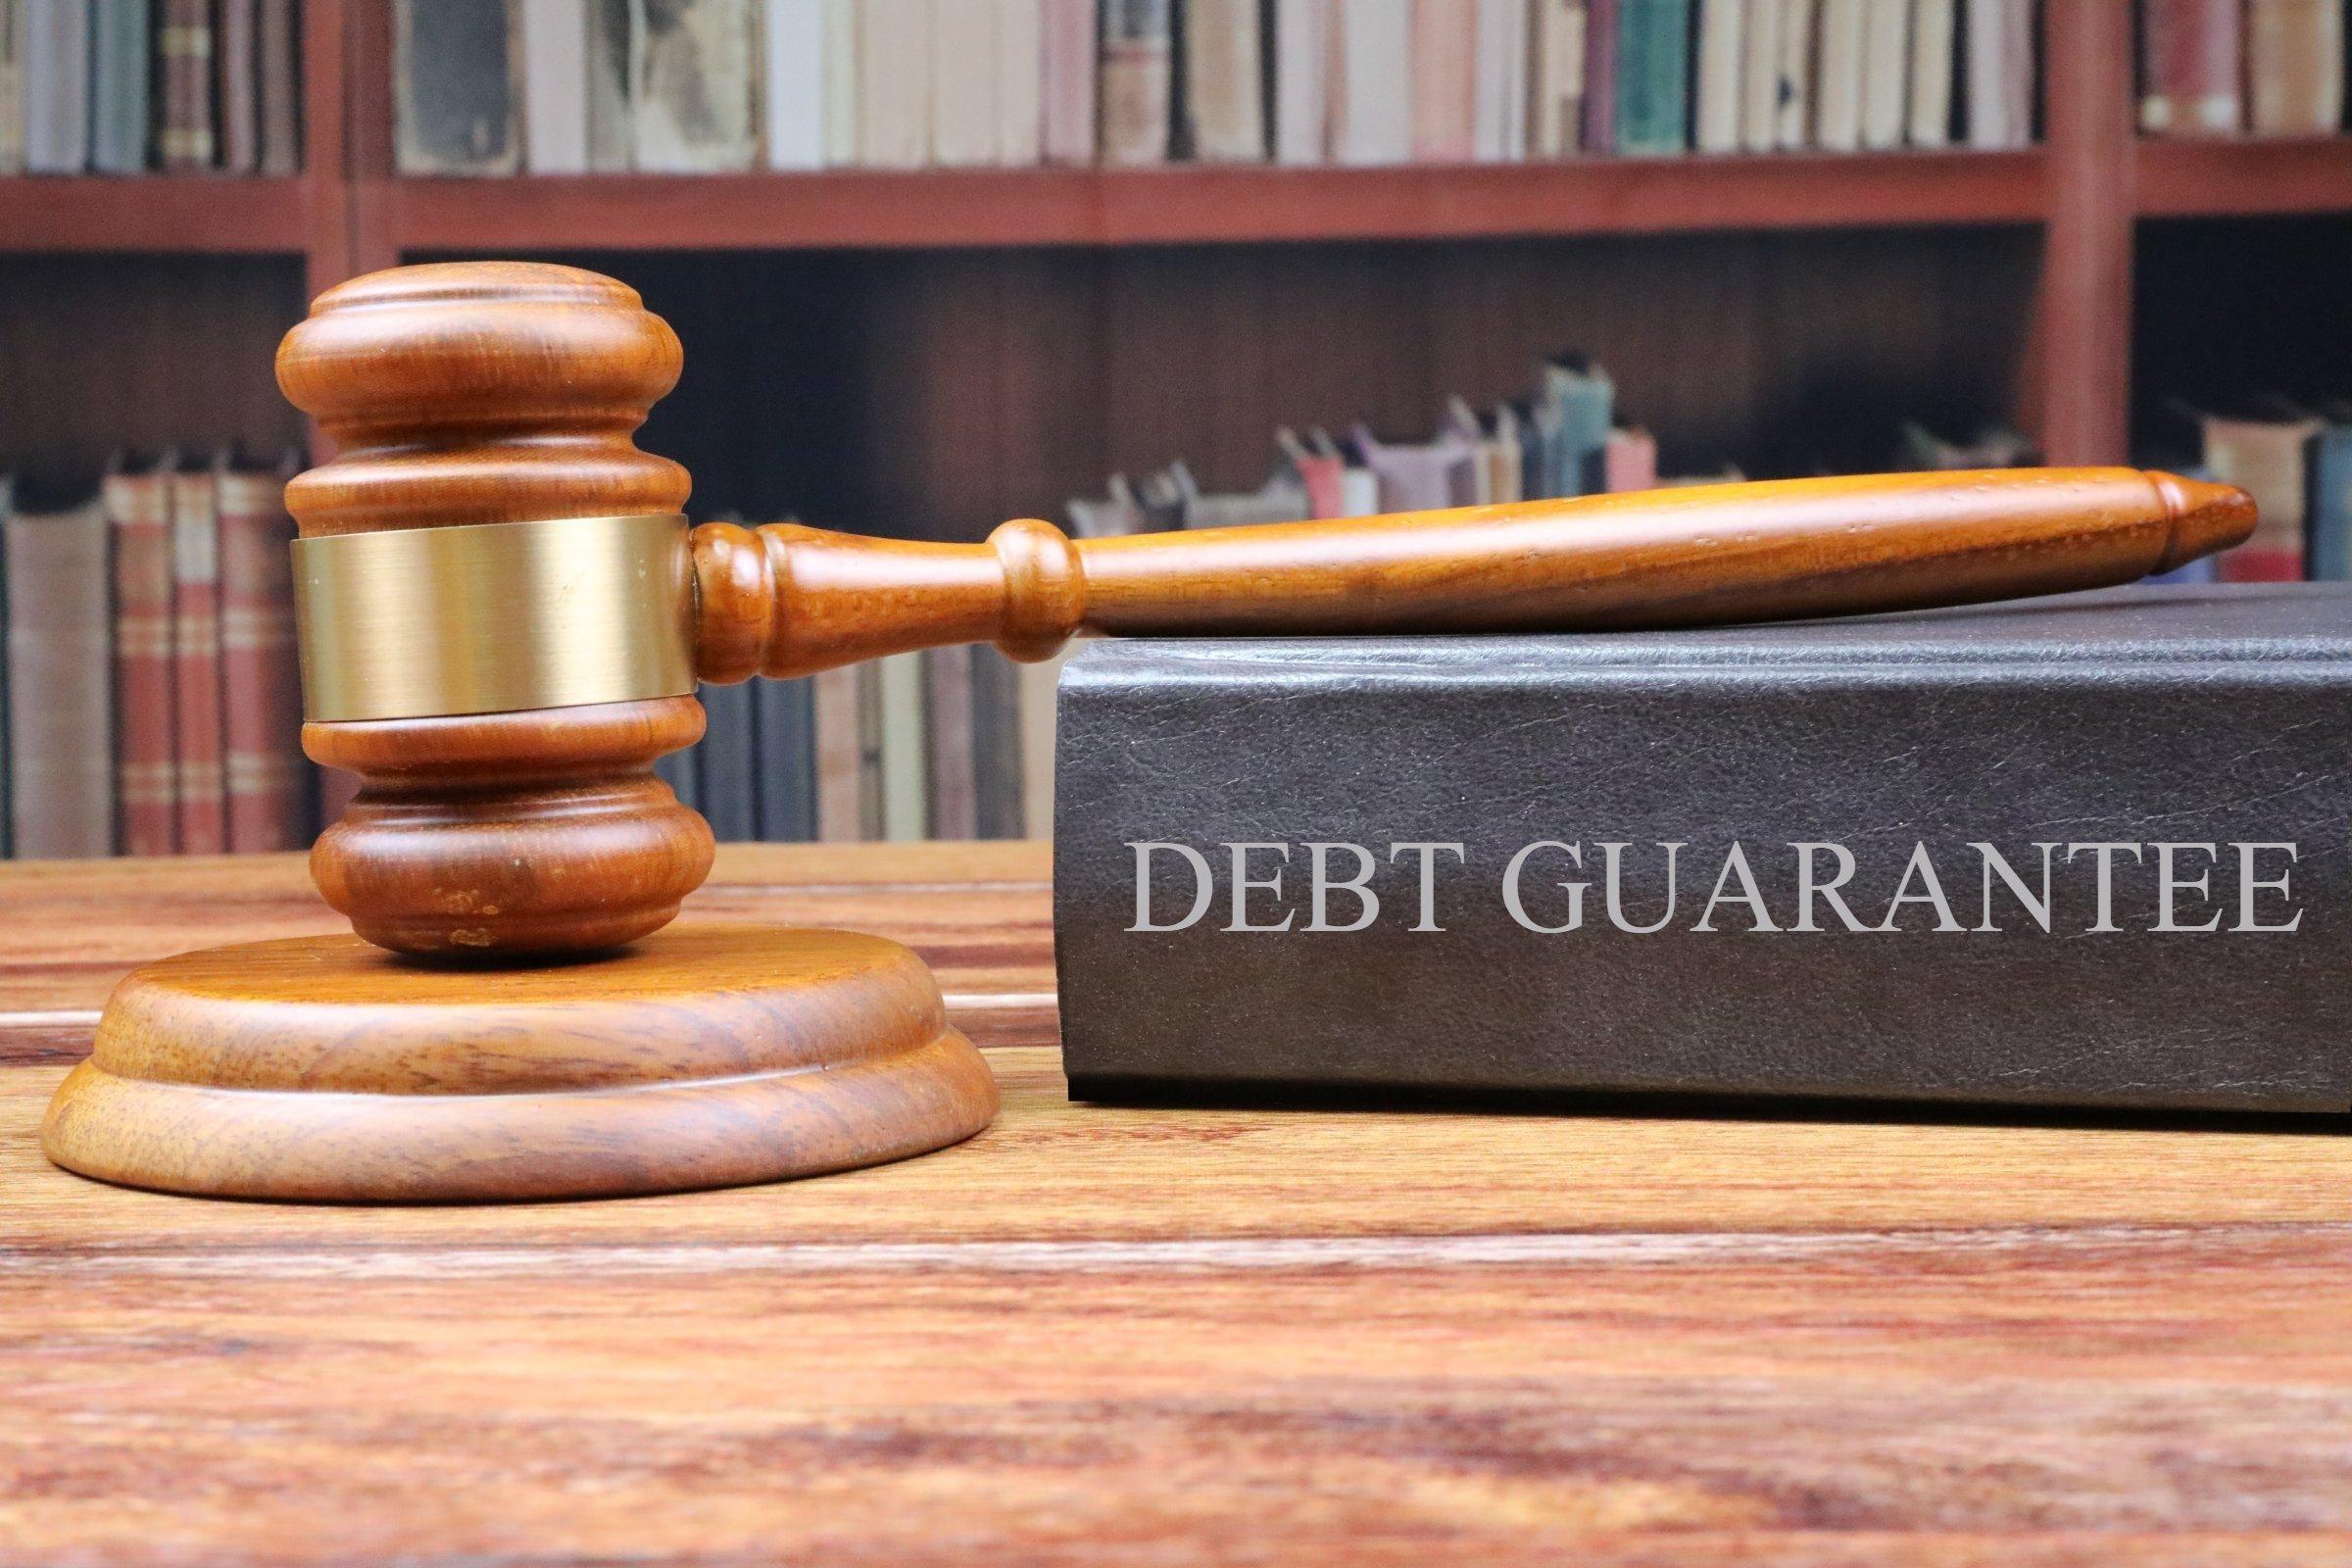 Debt Guarantee